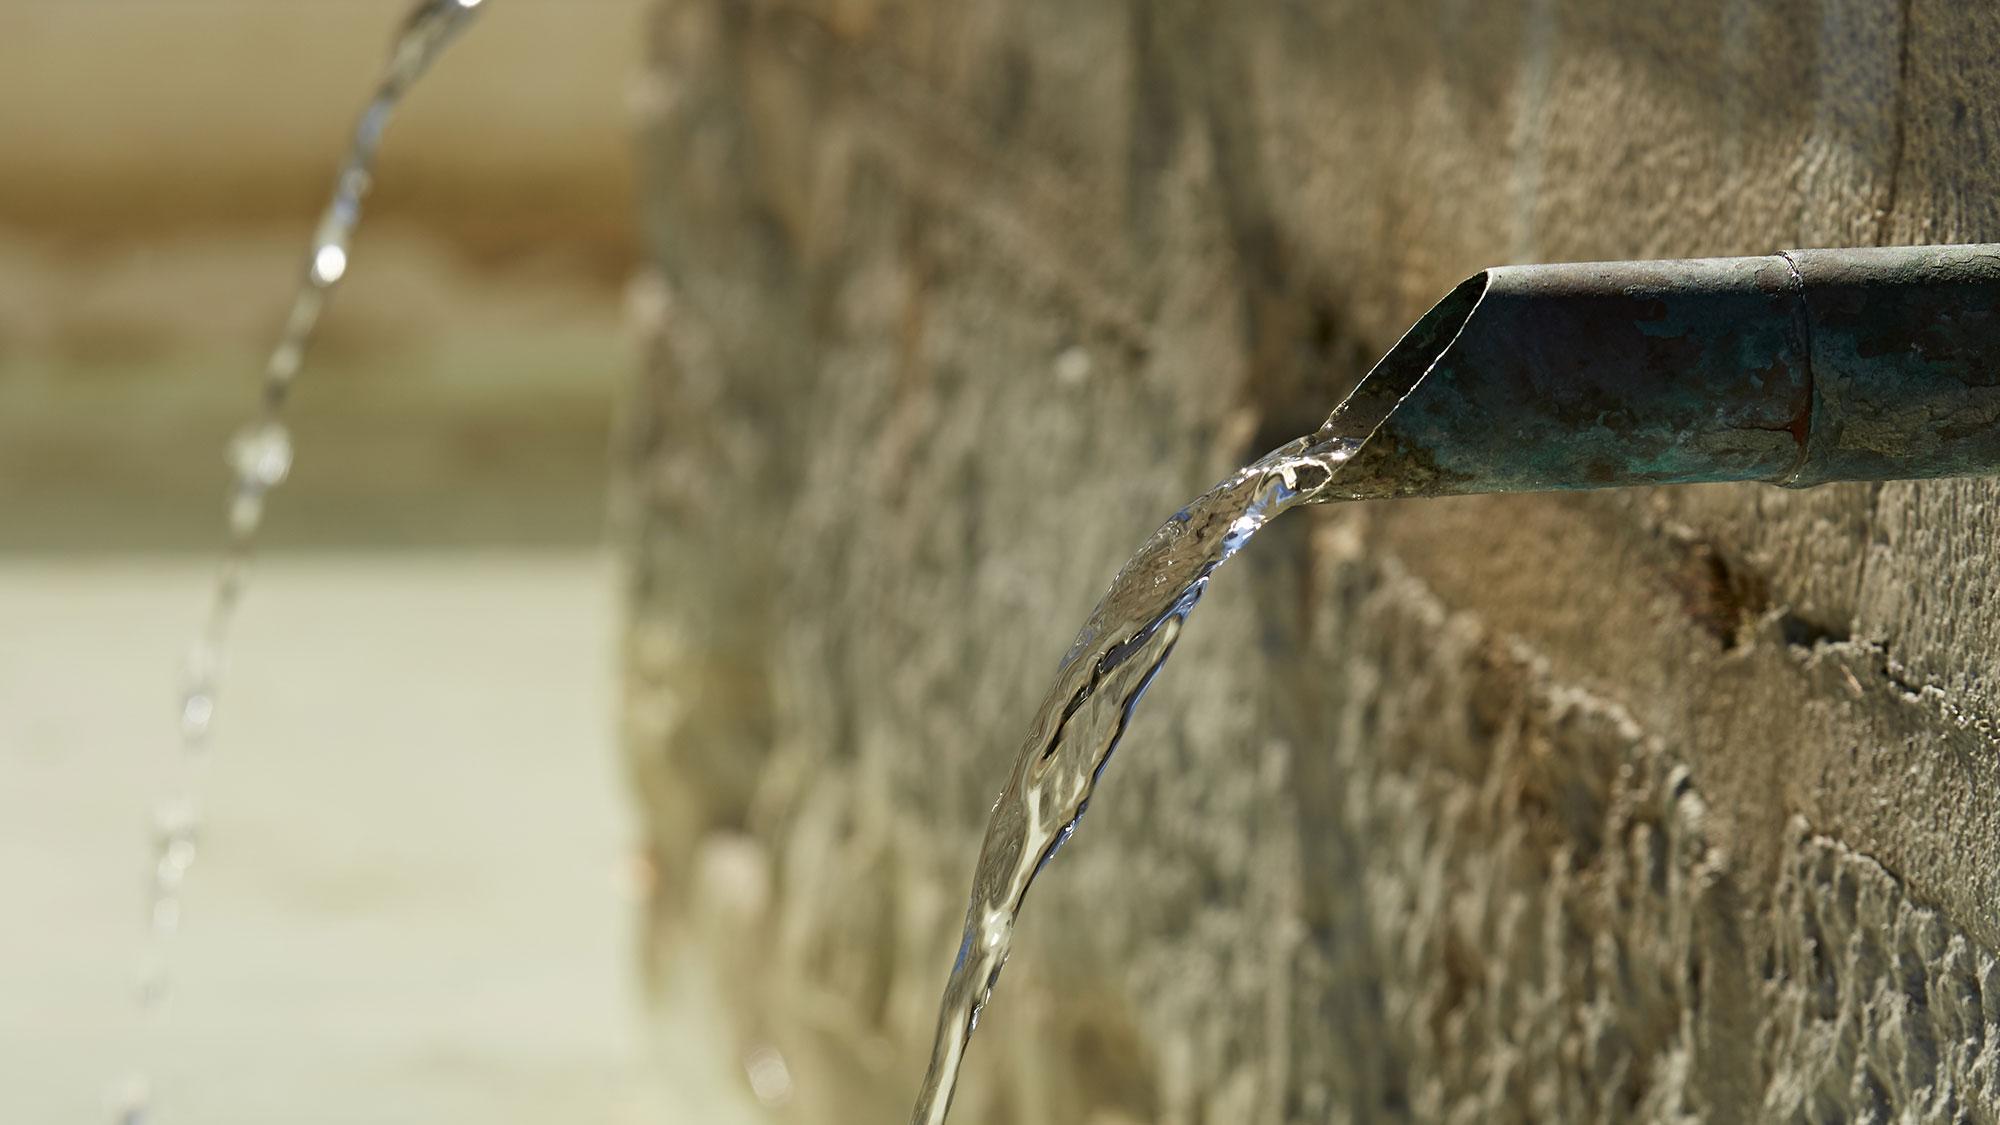 Access to water guaranteed